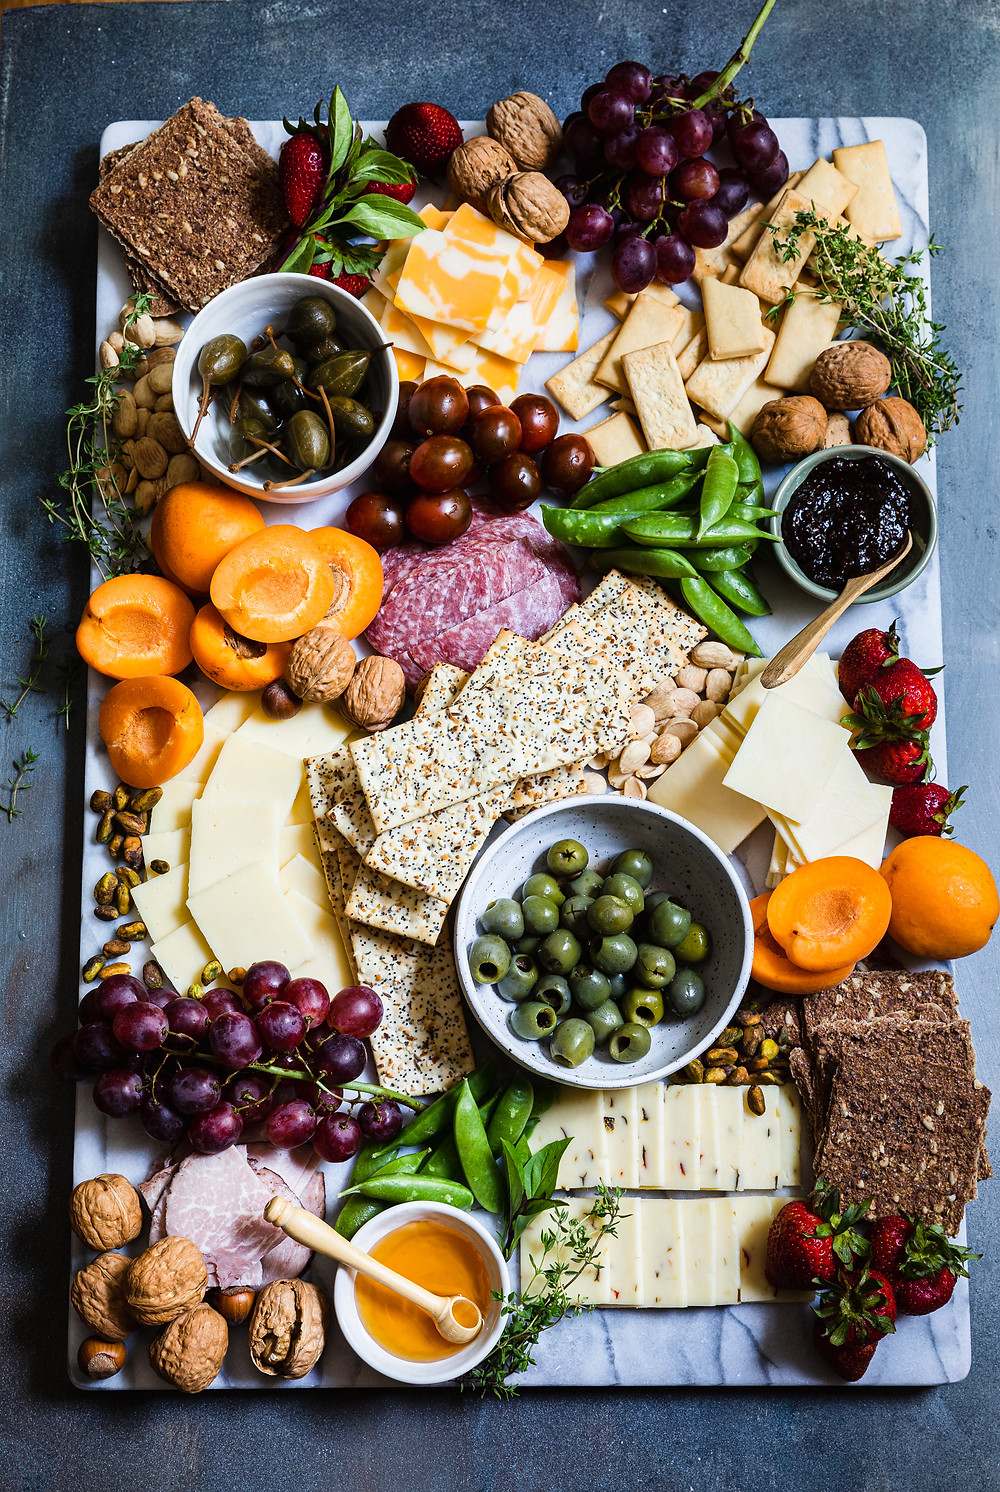 Creating a beautiful Cheese Board